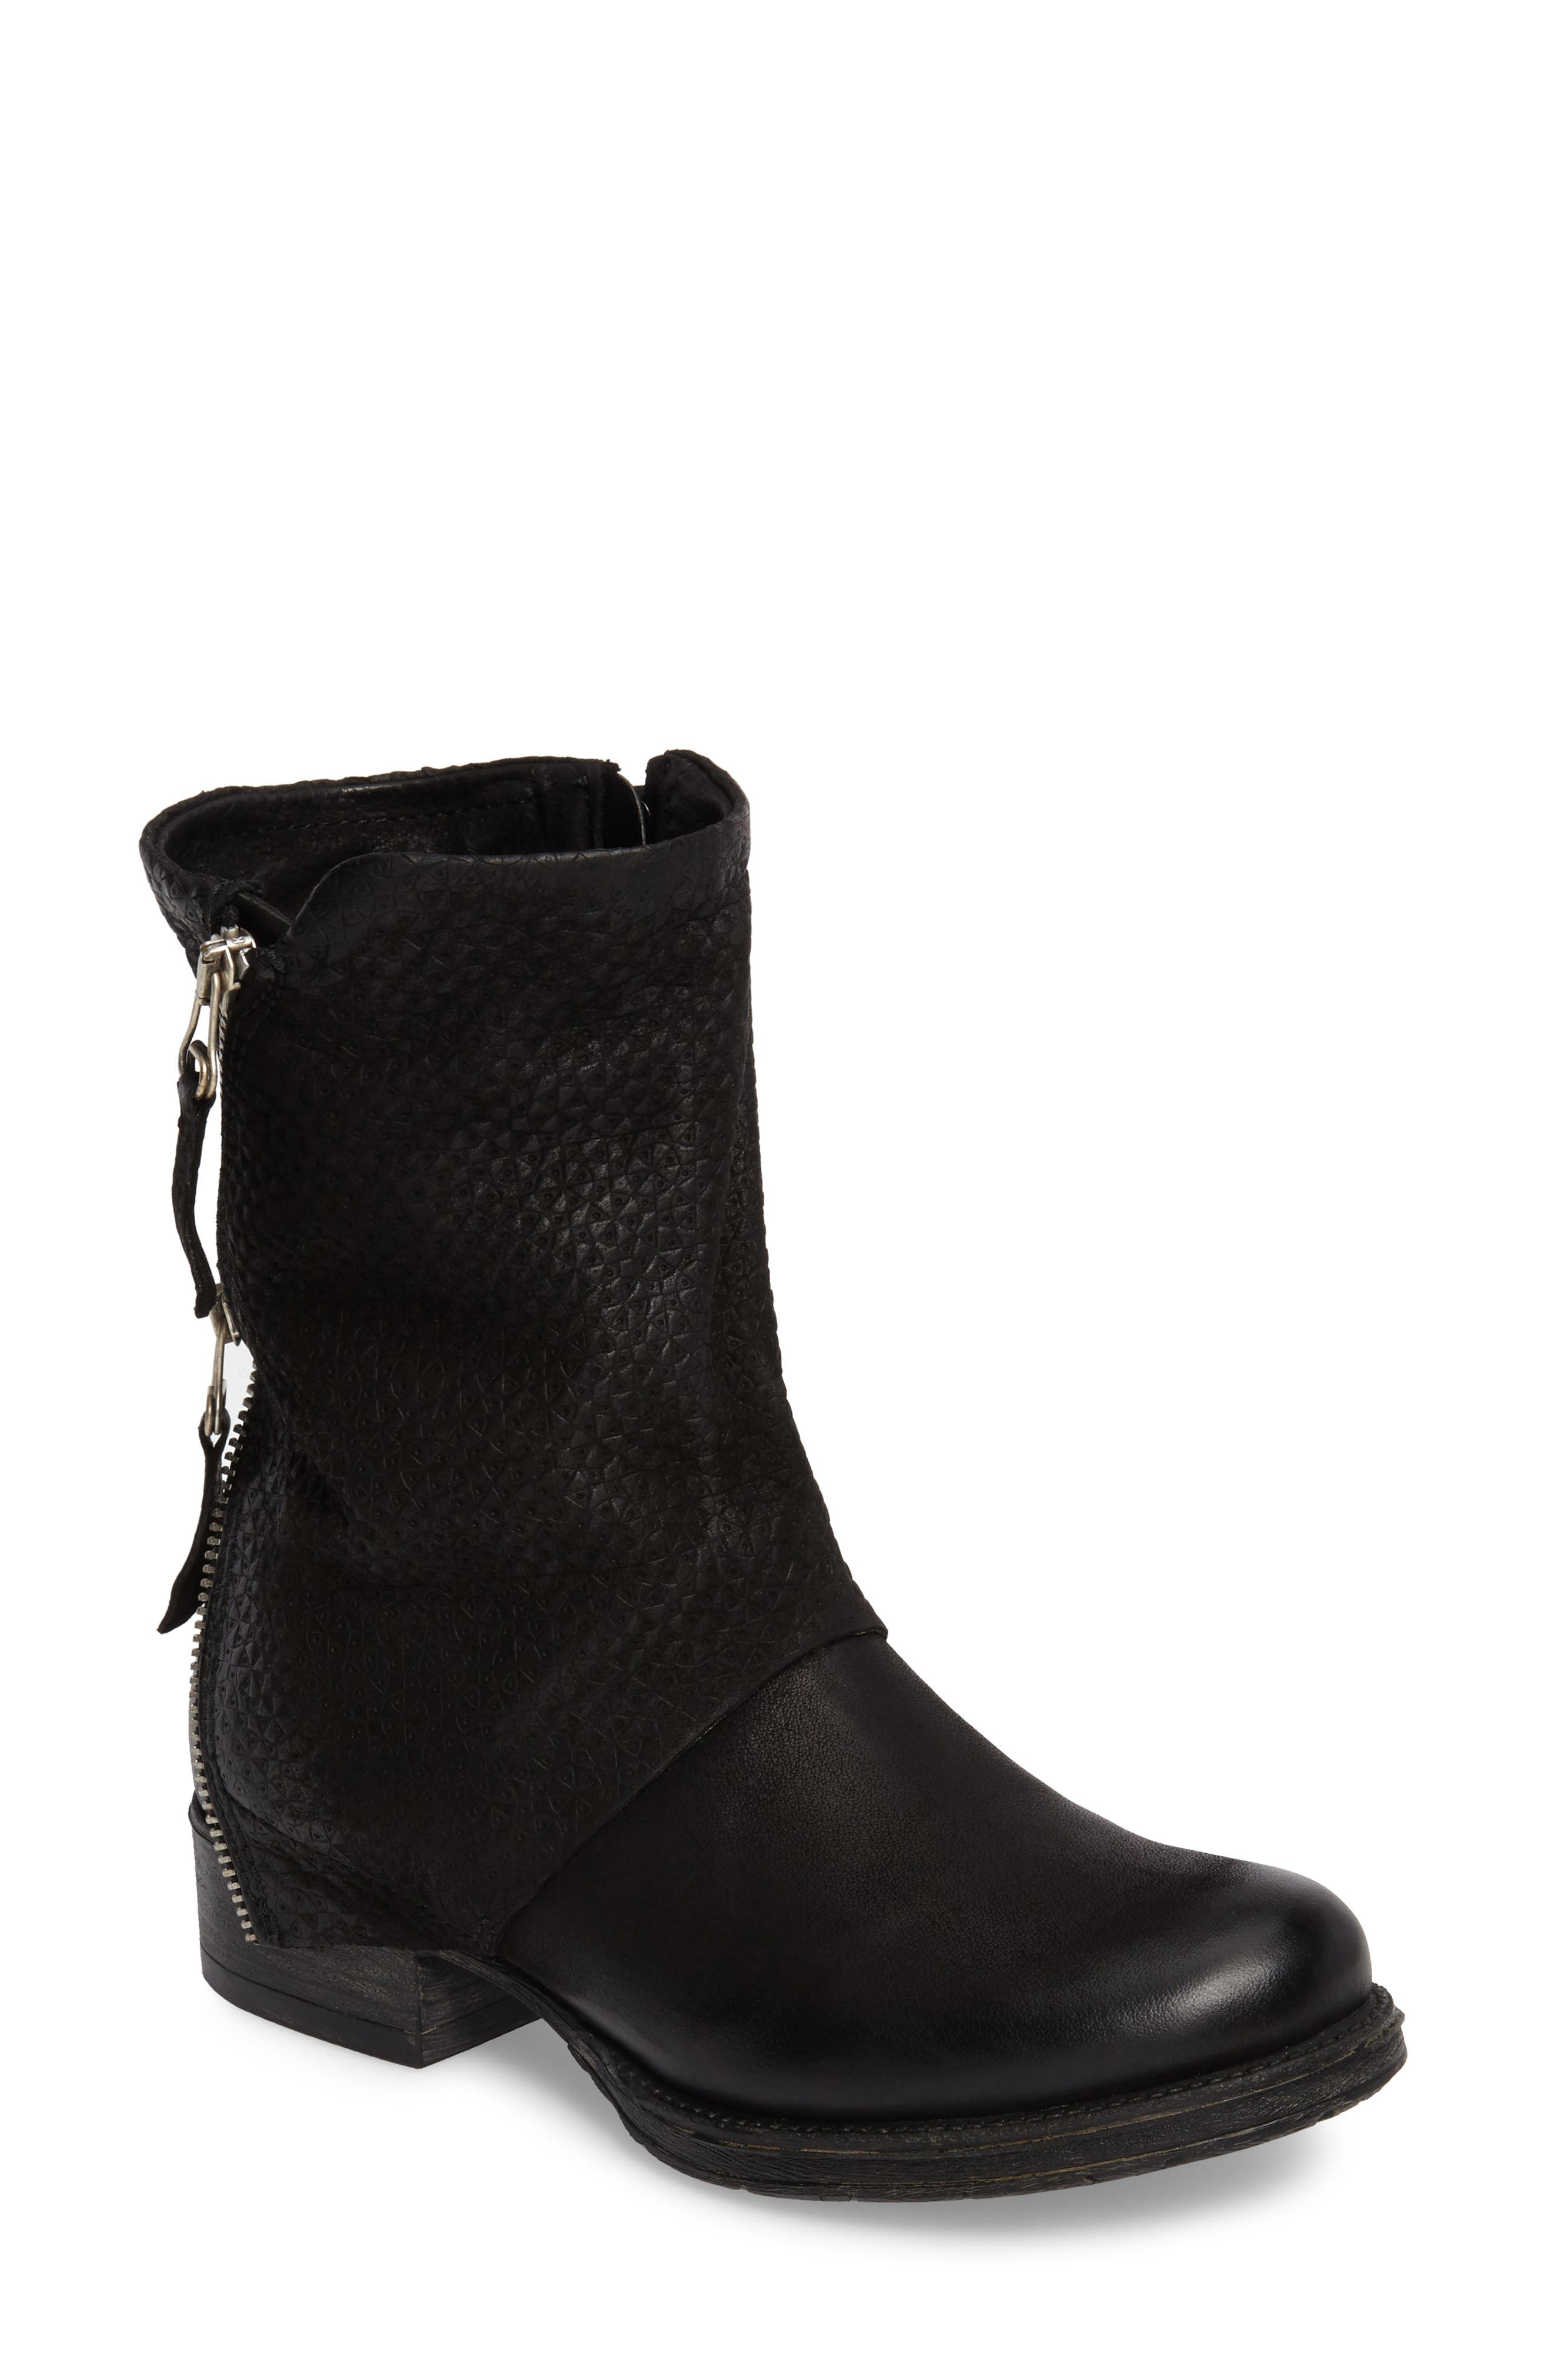 Main Image - Miz Mooz Nugget Asymmetrical Textured Boot (Women)